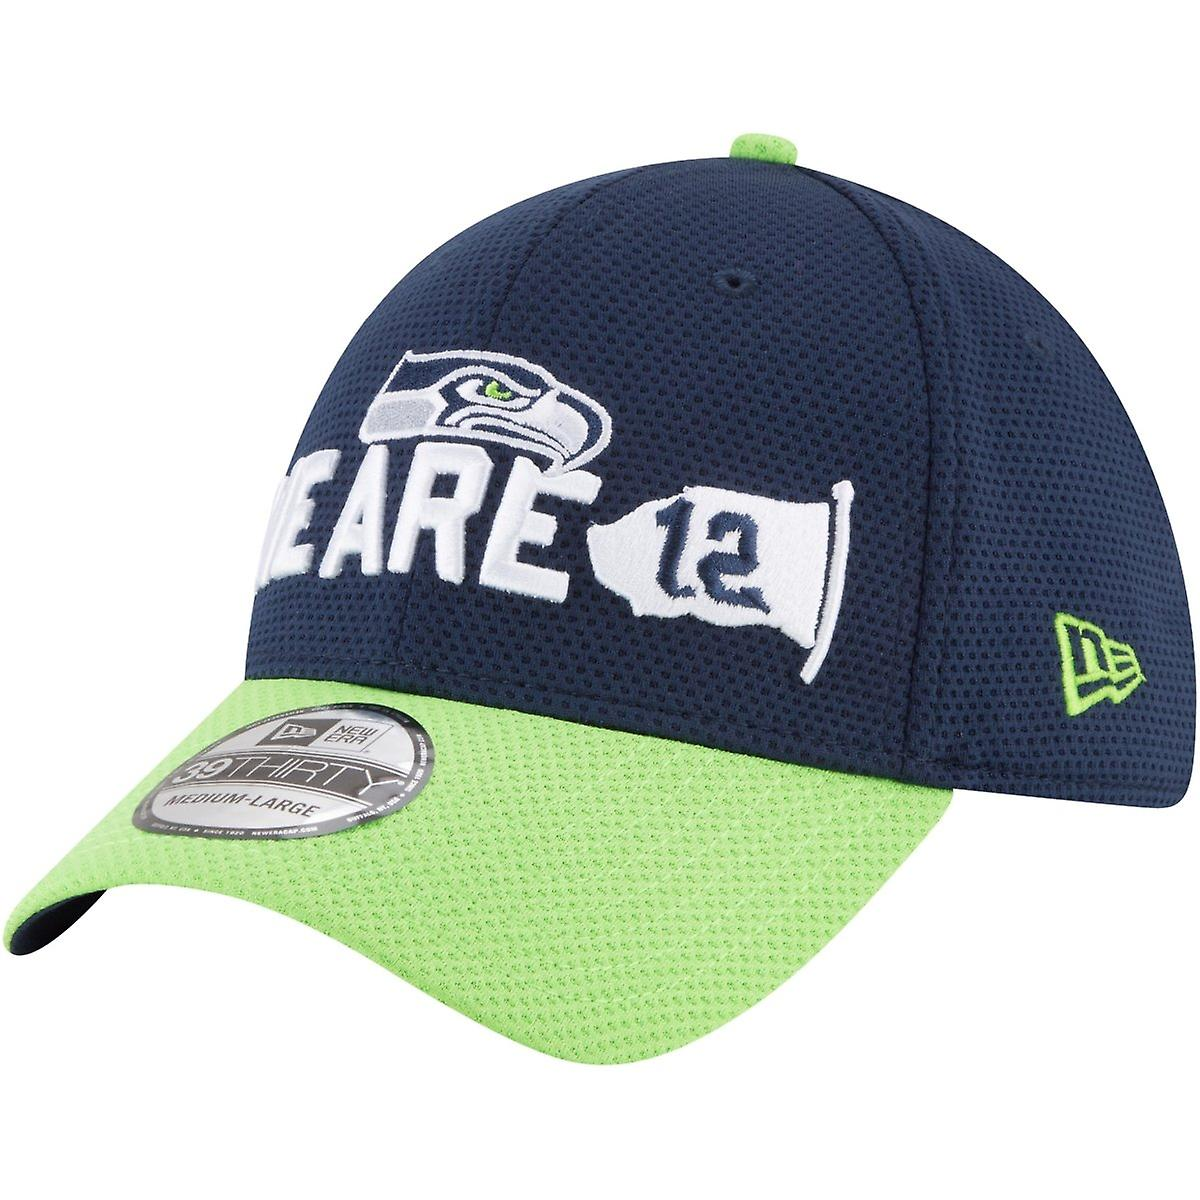 New era 39Thirty Cap - NFL 2018 DRAFT Seattle Seahawks  17588b705